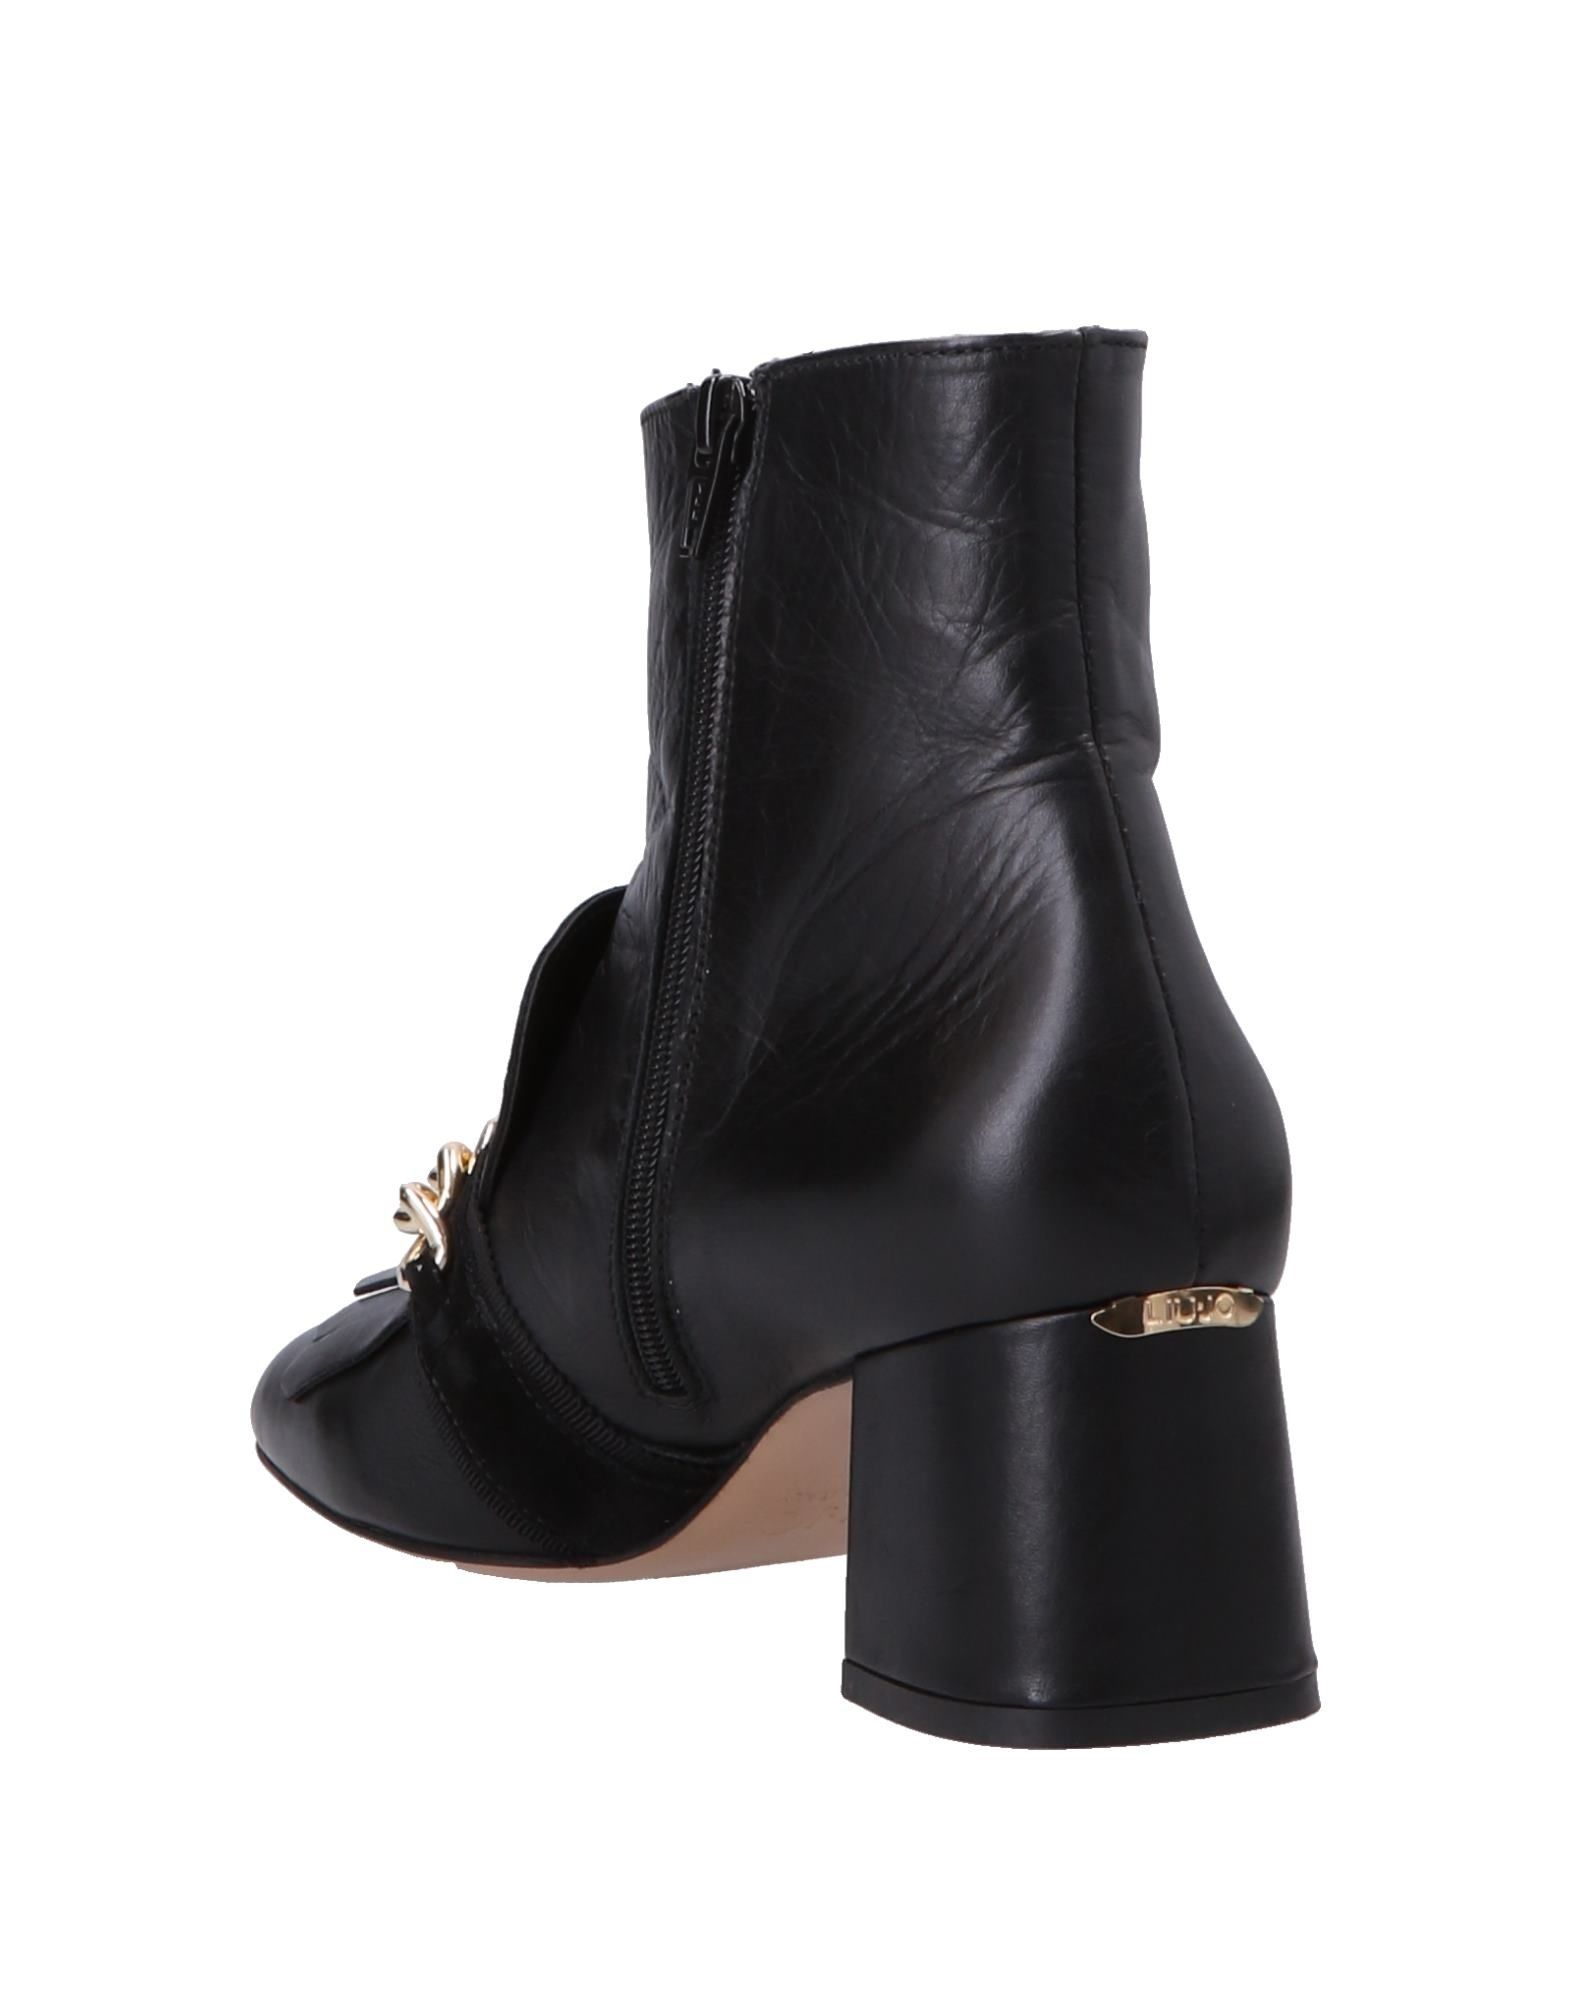 Stilvolle Stilvolle Stilvolle billige Schuhe Liu •Jo Stiefelette Damen  11544347EL 2d9e30